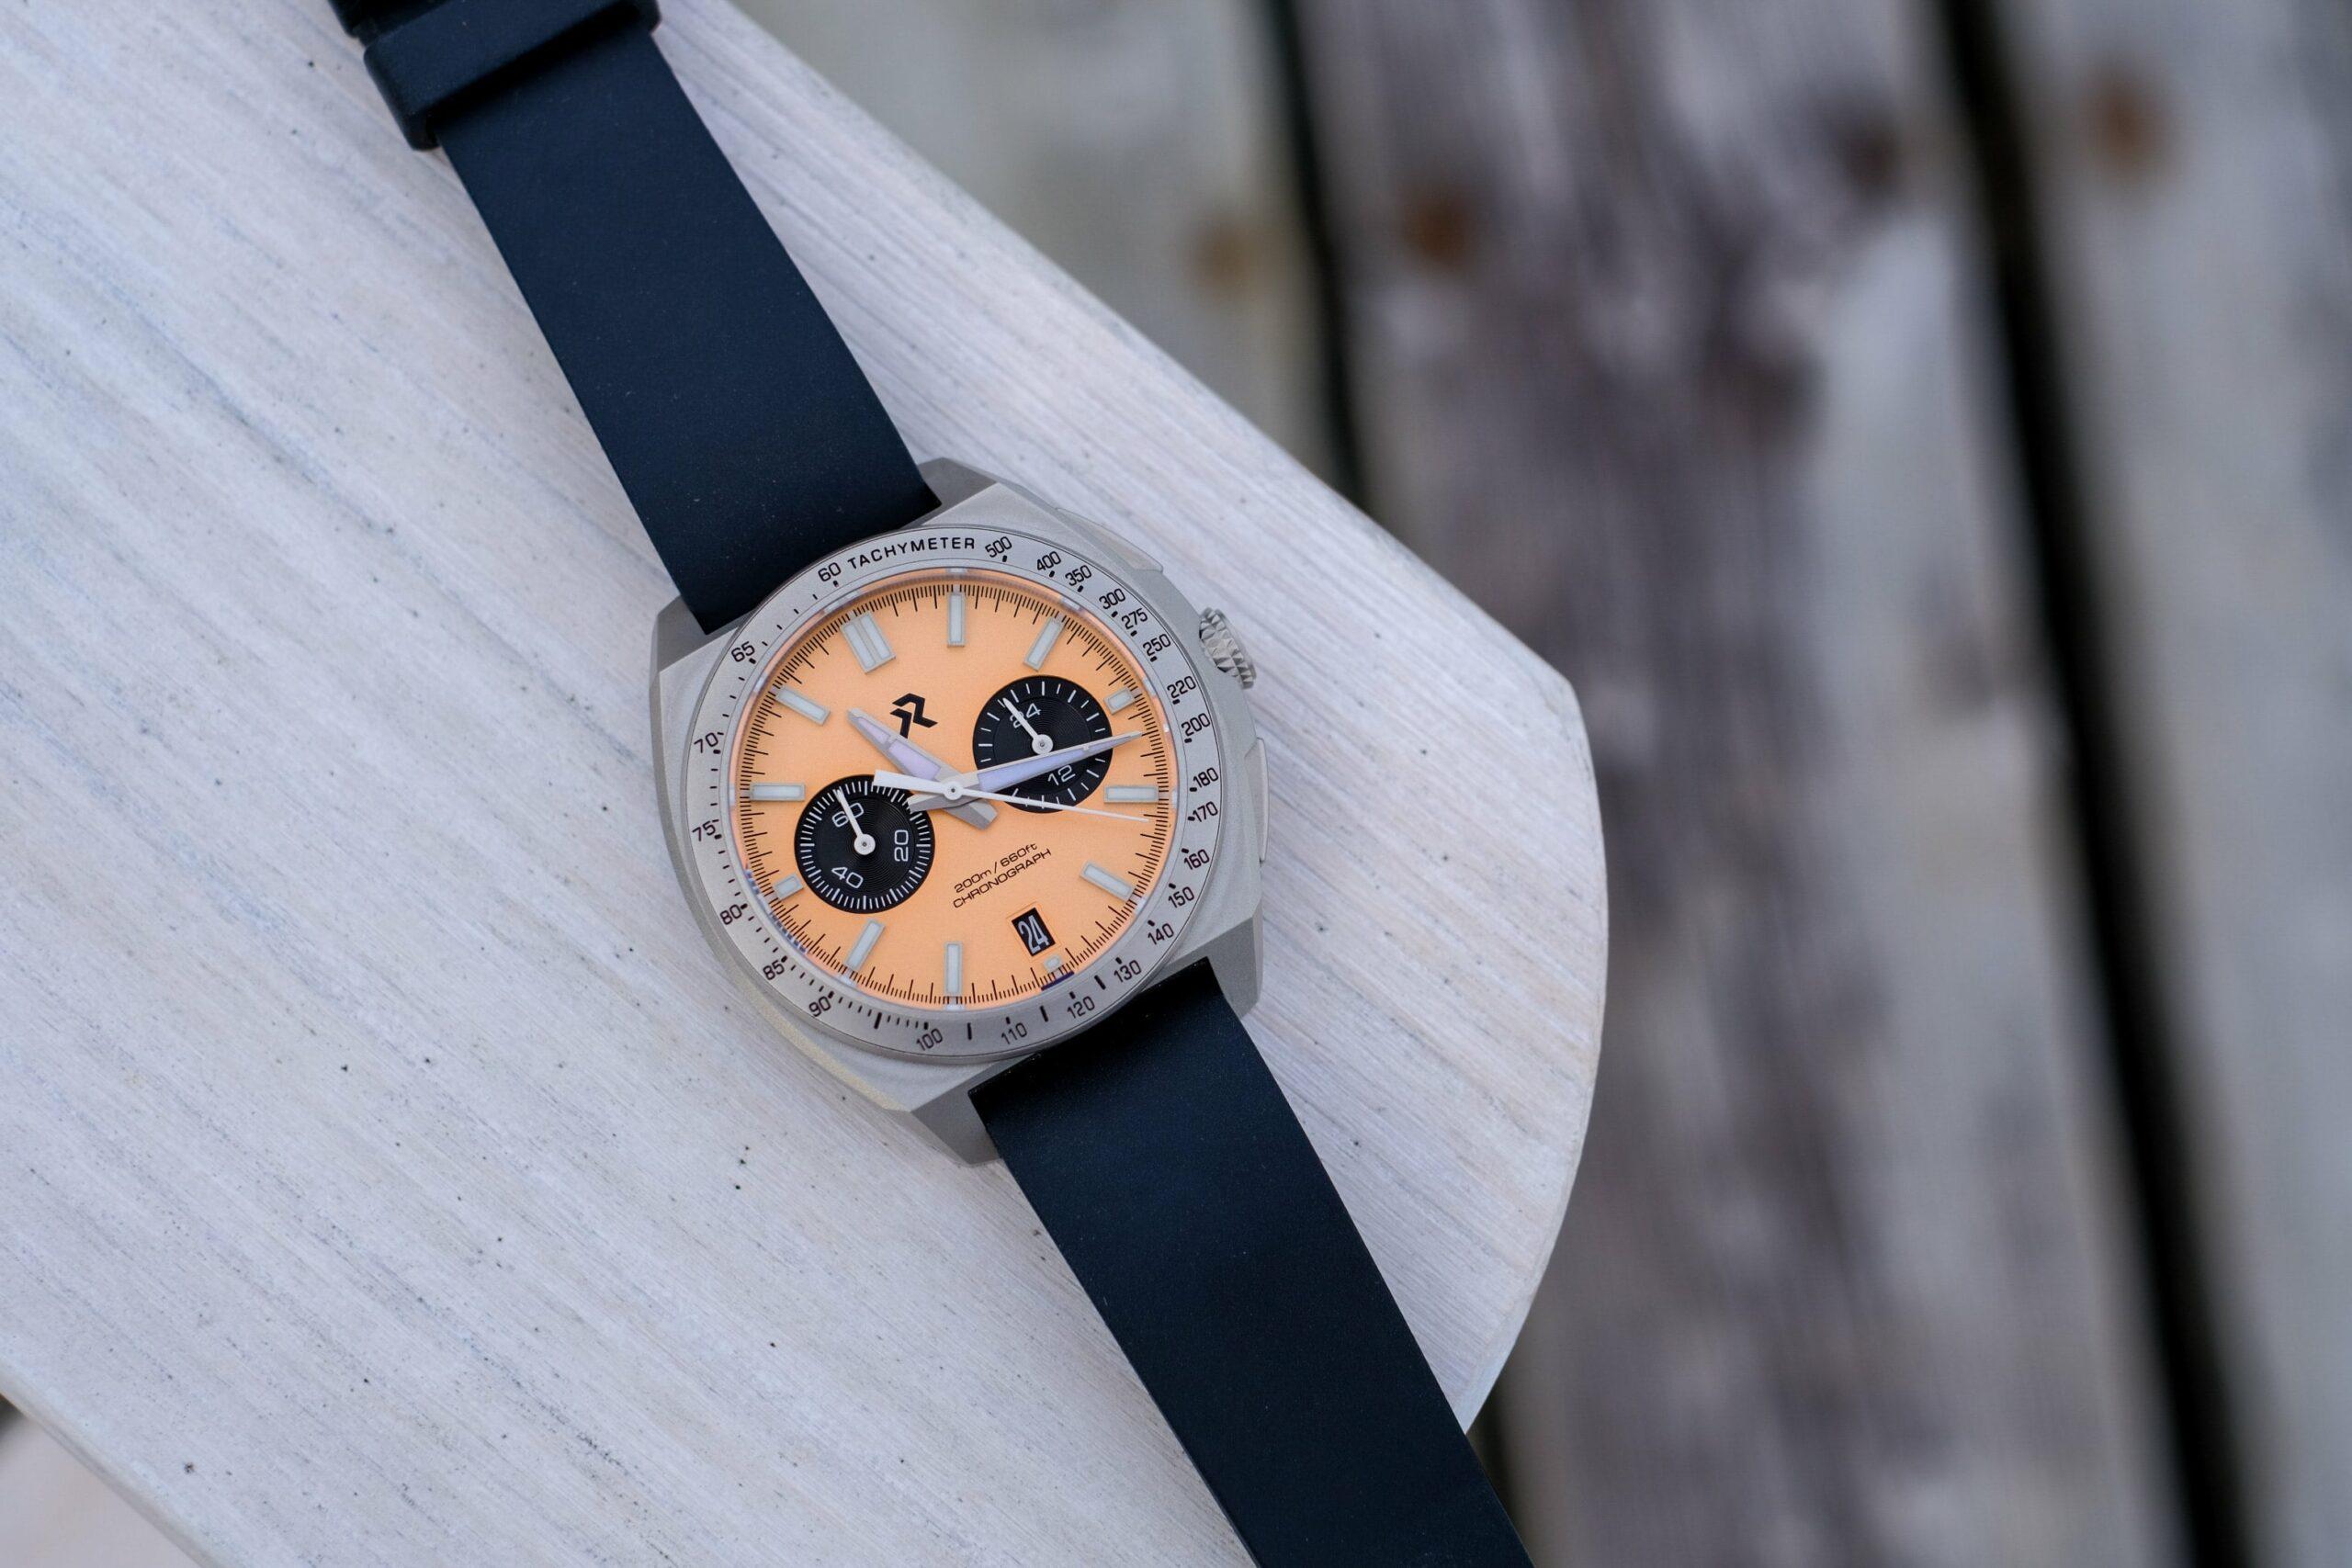 RZE Valour Titanium Meca-Quartz Chronograph Watch Review